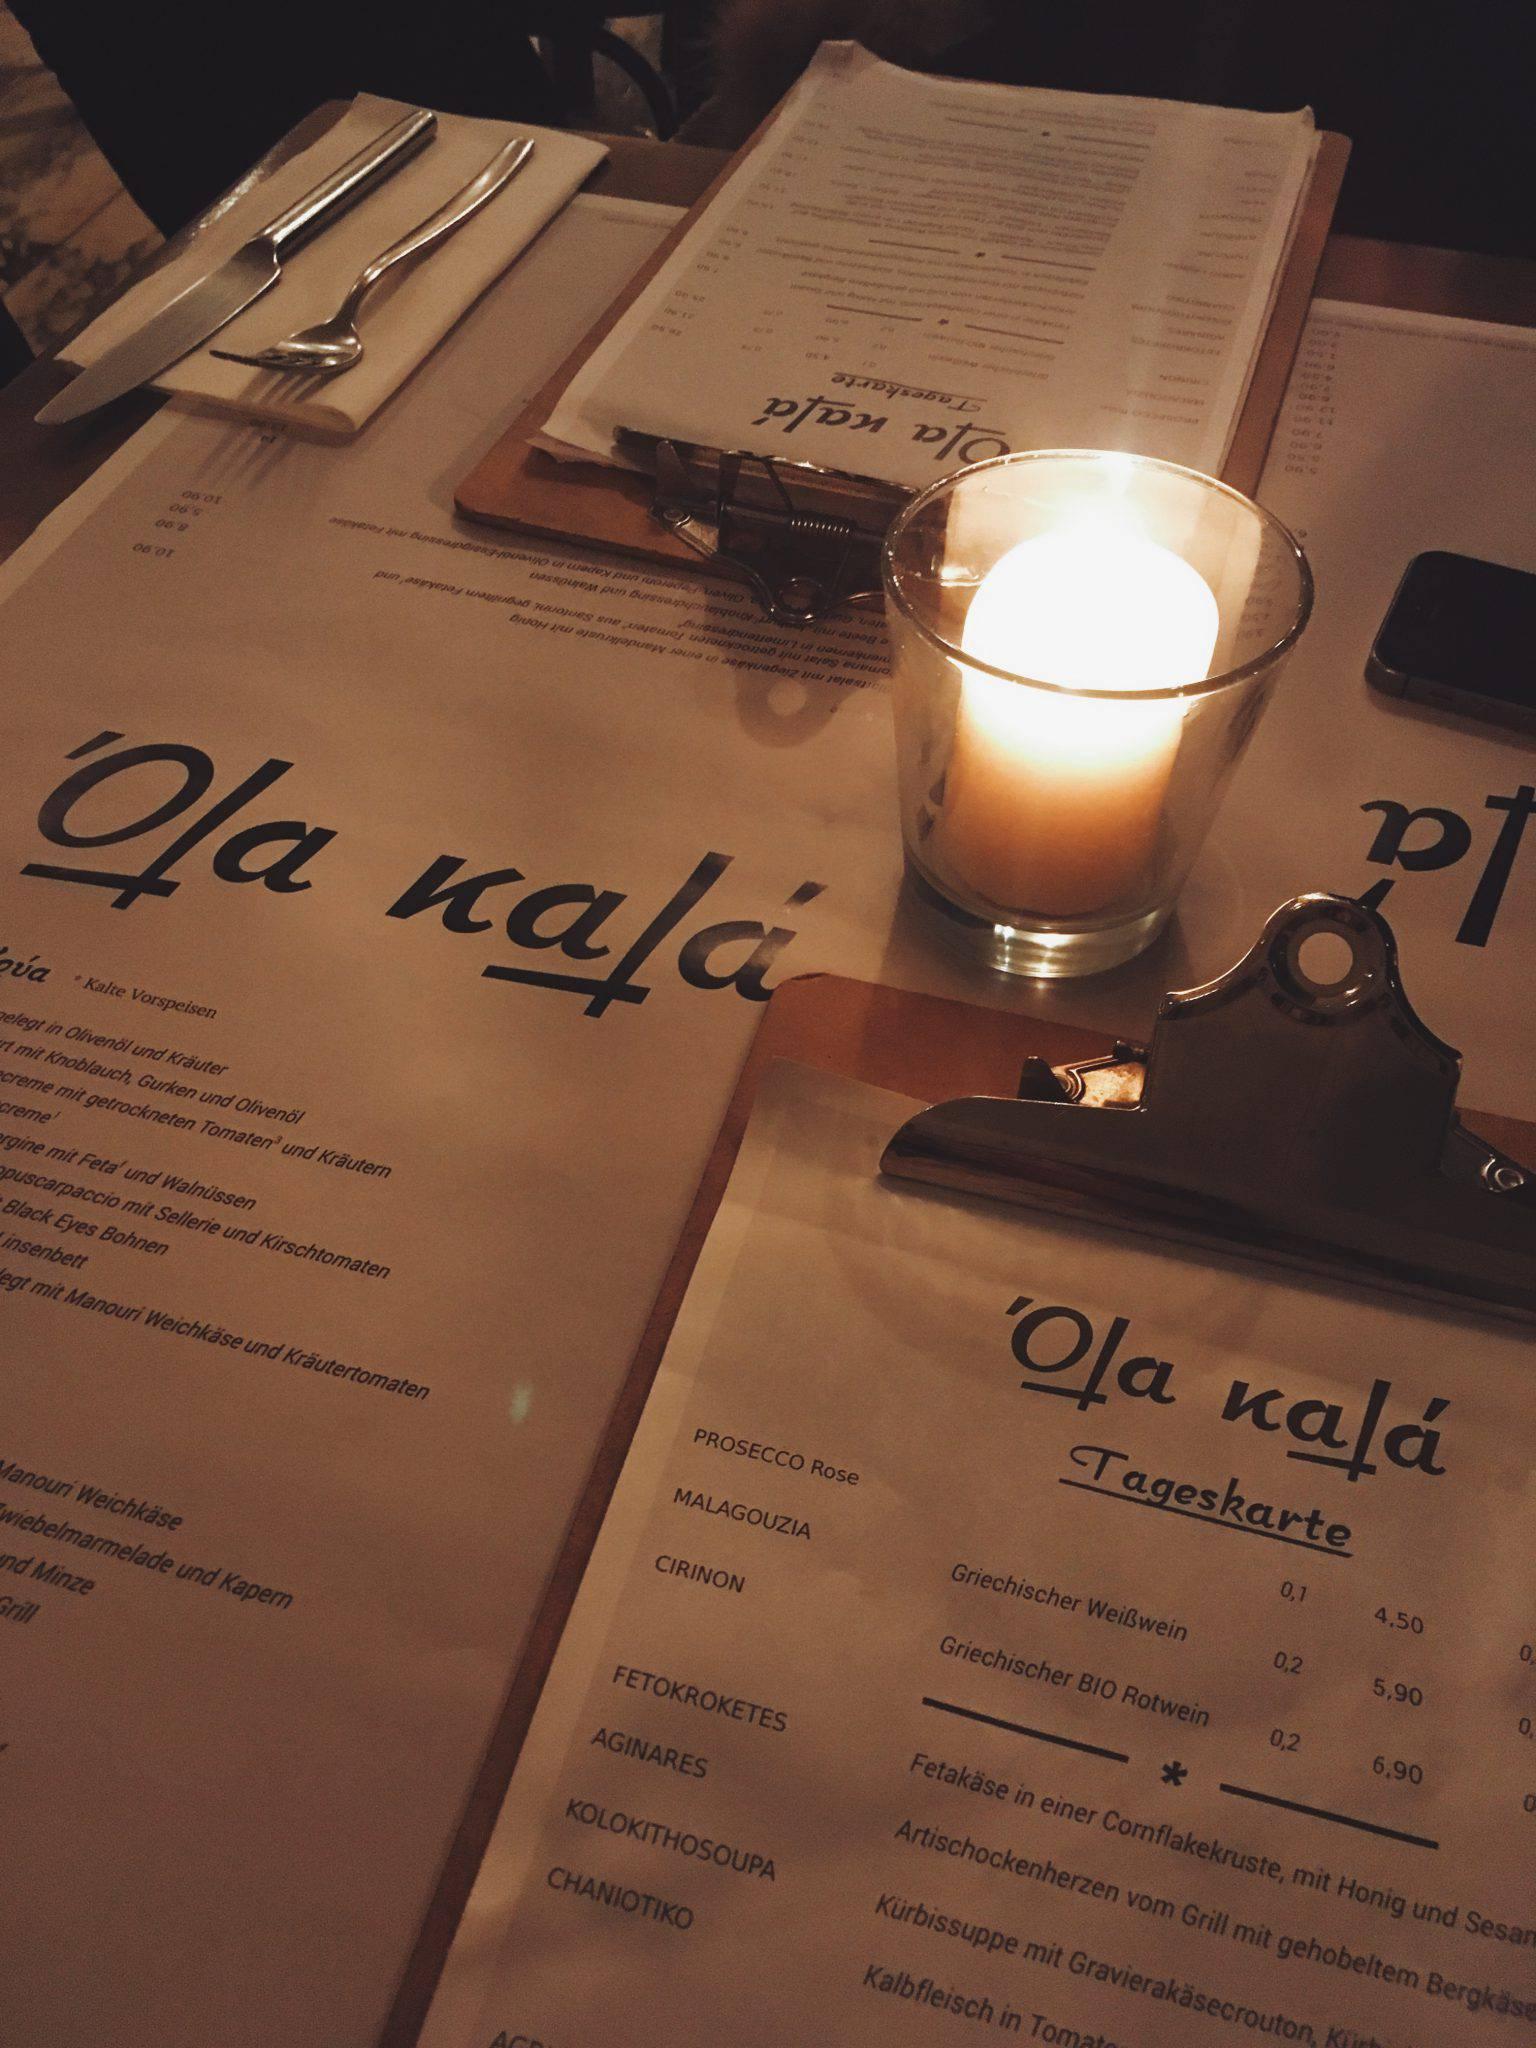 Ola kala - Griechisches Restaurant - Schwabing - Muenchen